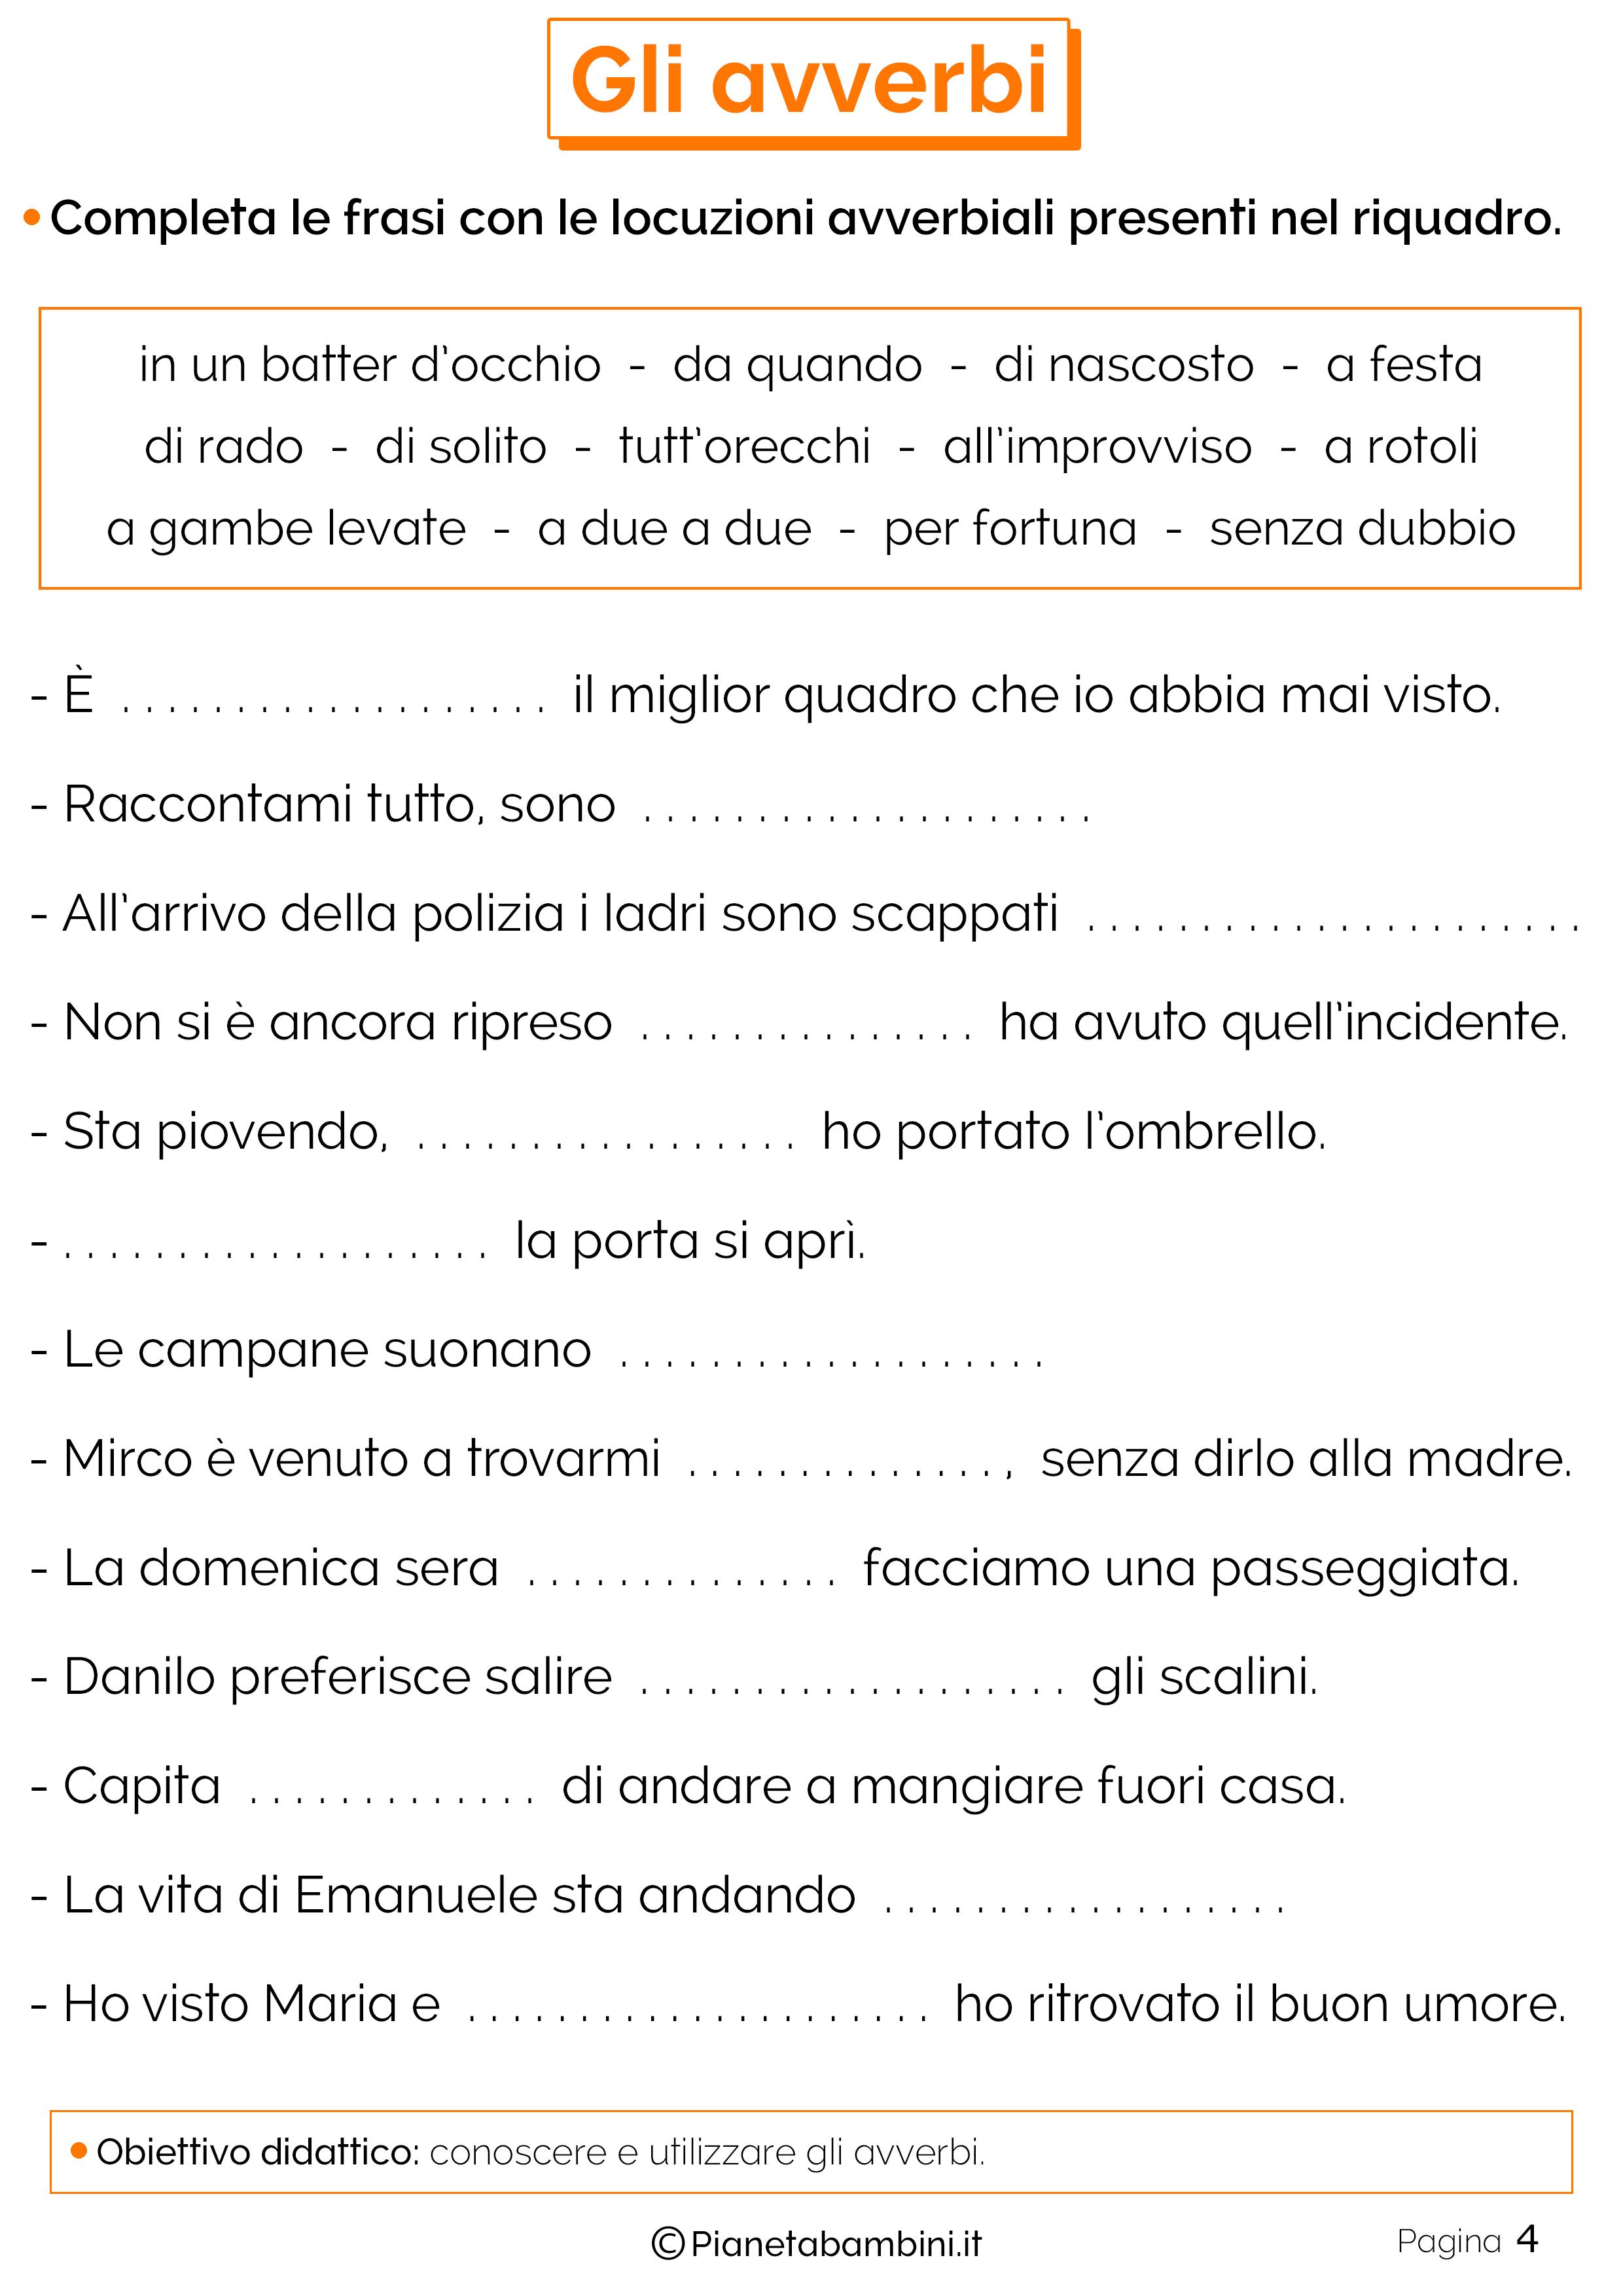 Esercizi sugli avverbi 4